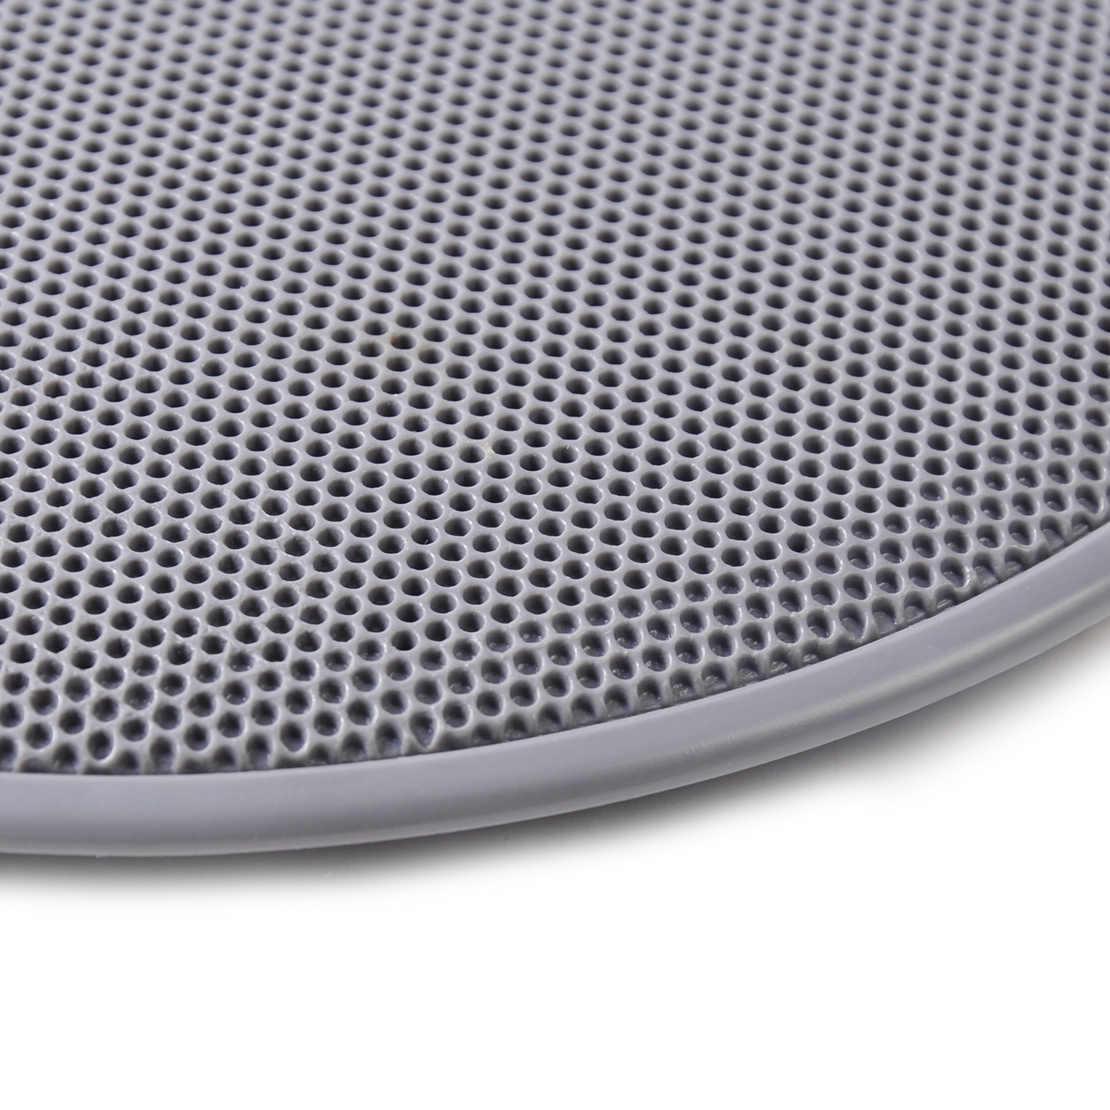 medium resolution of  dwcx 2x door loud speaker cover grill 3b0868149 for volkswagen passat b5 jetta mk4 golf gti